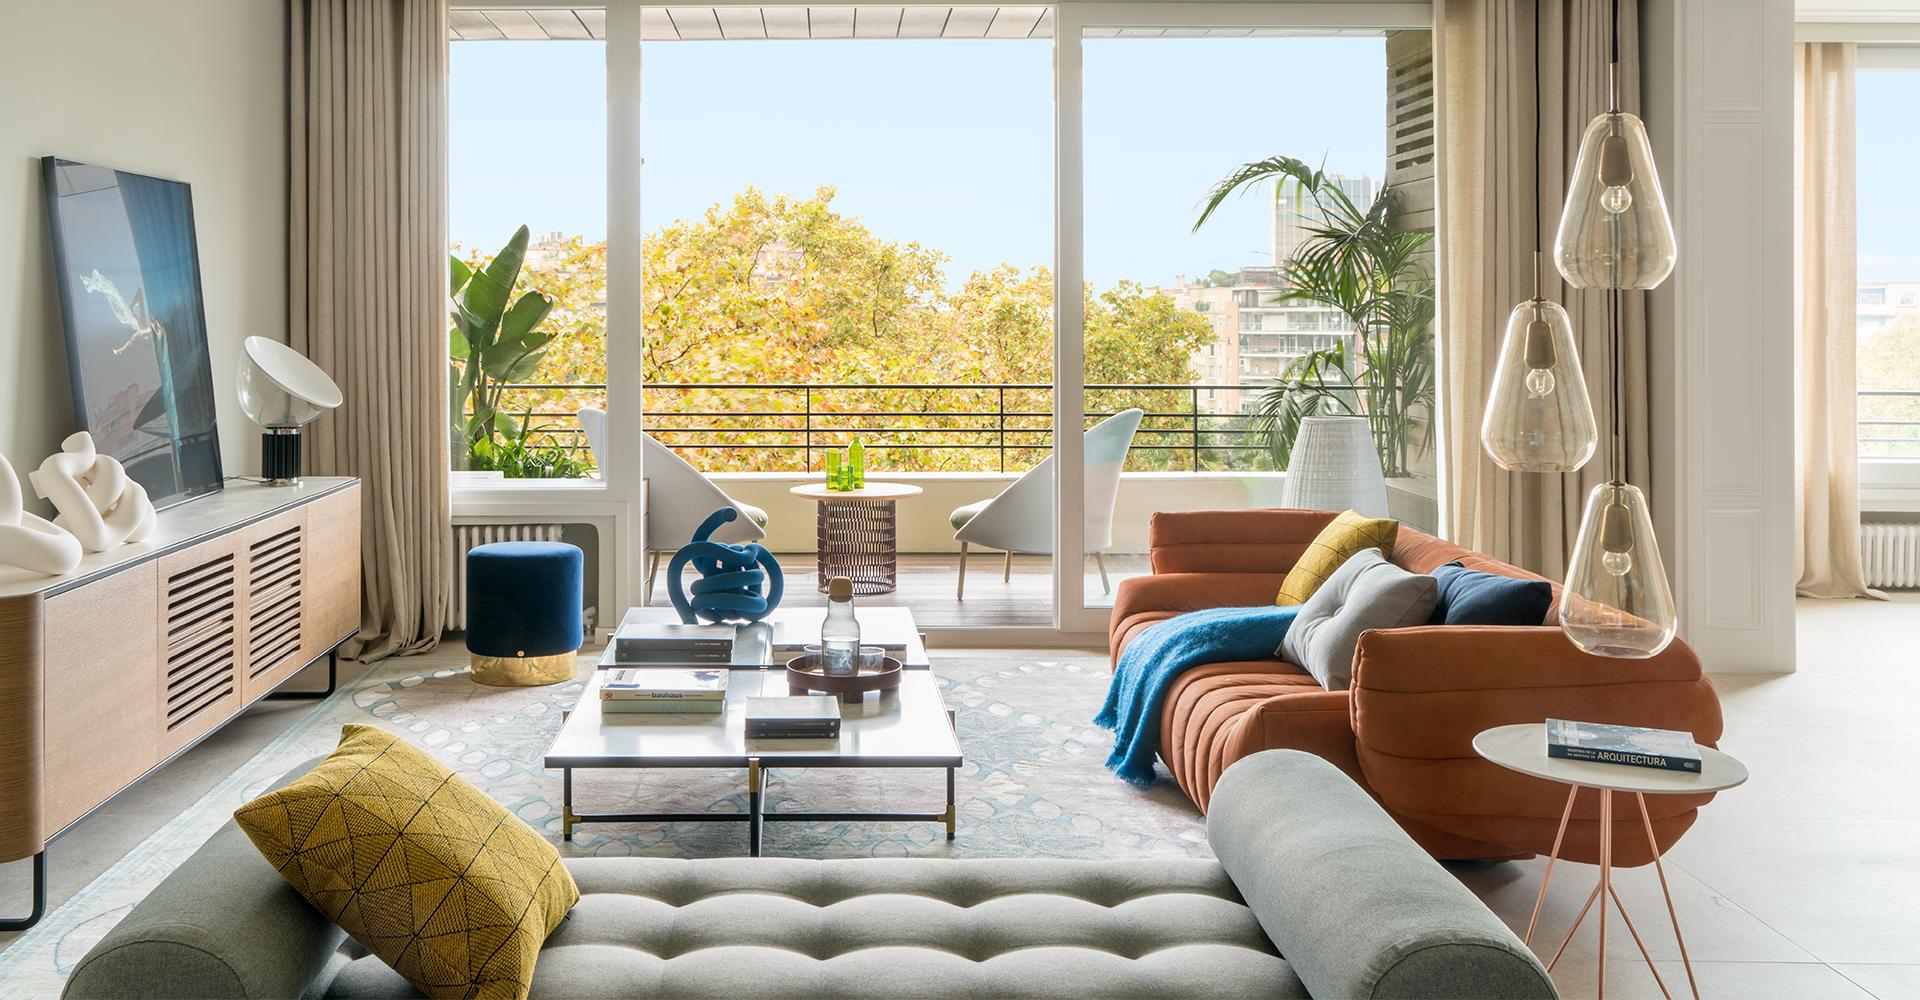 Mobilier design pour salon - The Room Studio & Momocca